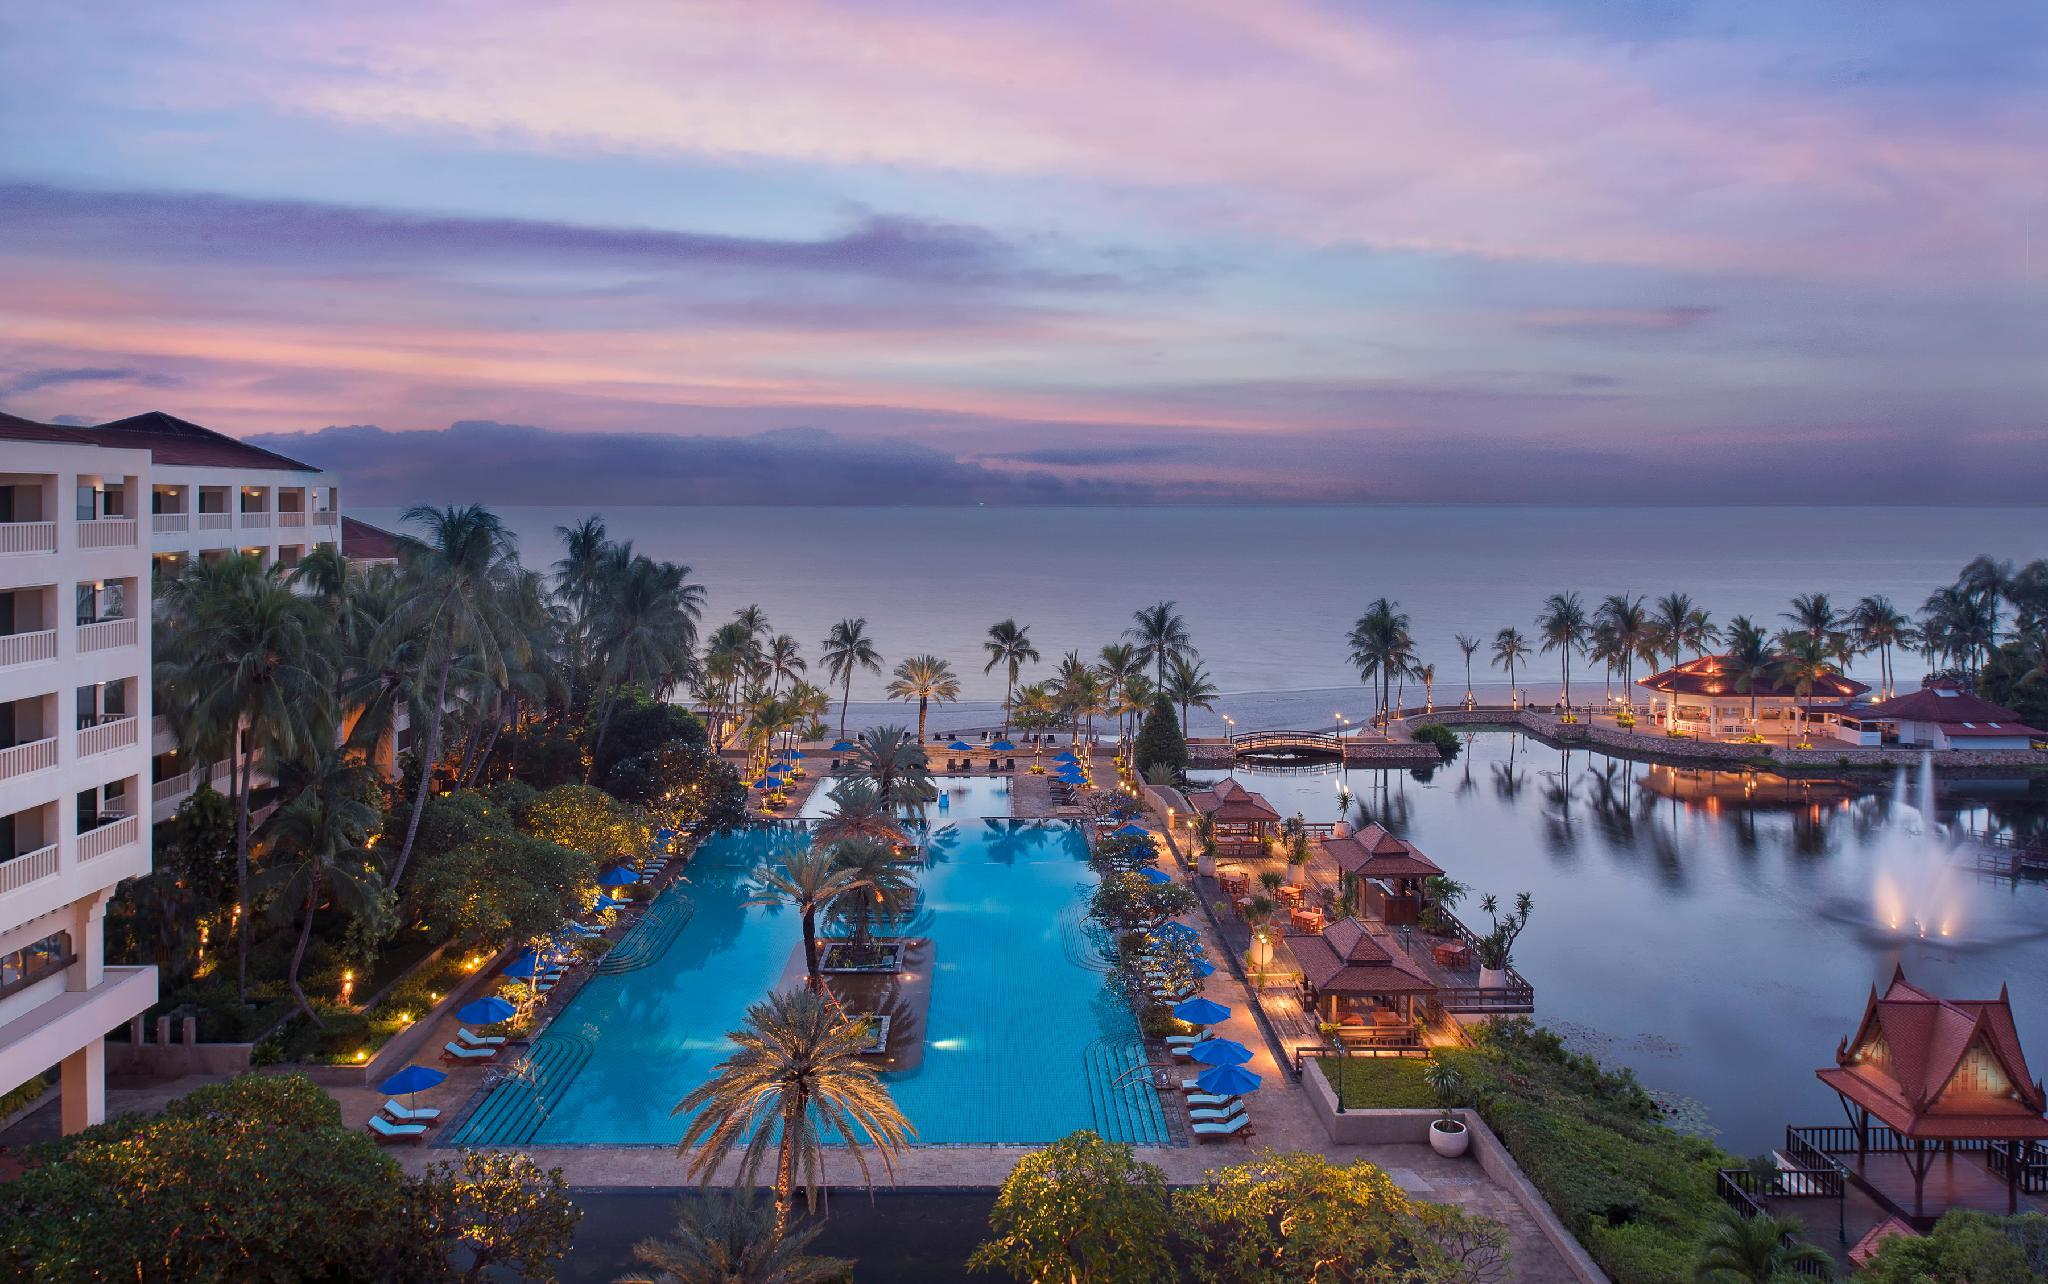 Dusit Thani Hua Hin Hotel - Hua Hin